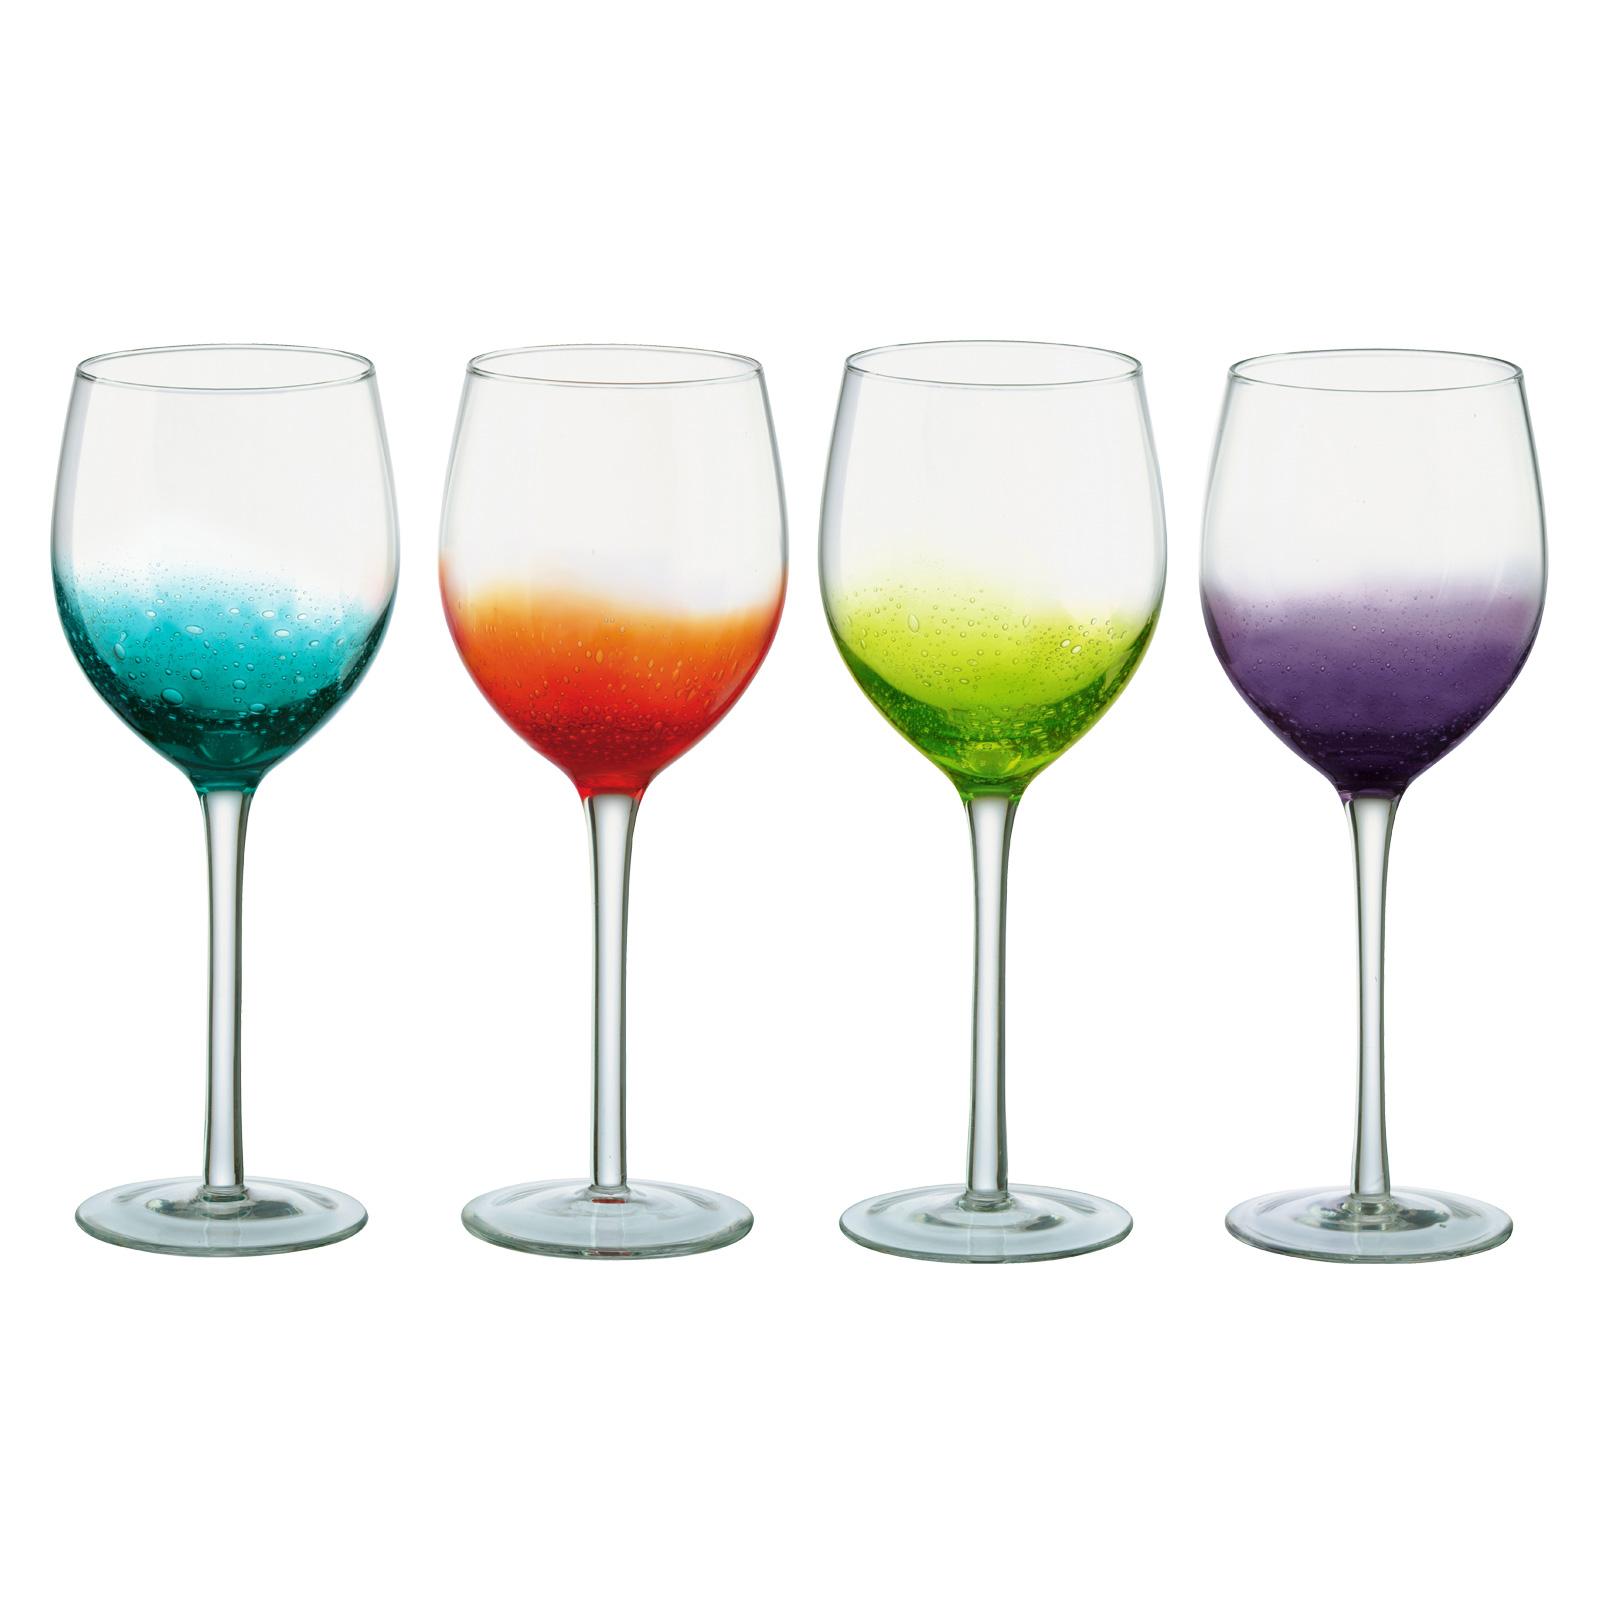 Set of 4 Fizz Wine Glasses